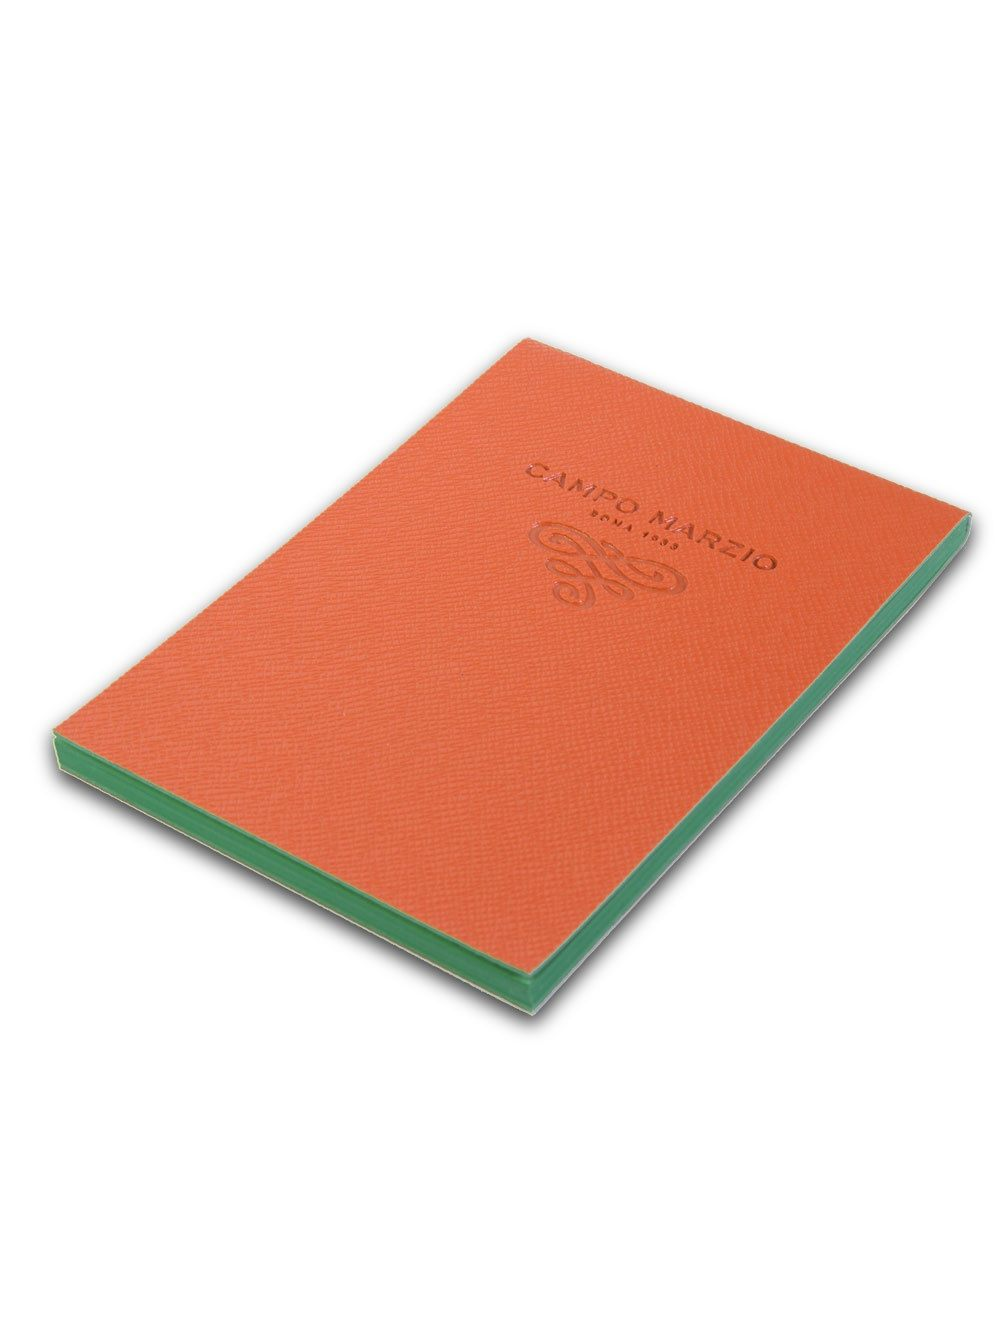 Notes 15 X 21 Cm Saffiano - Mandarin